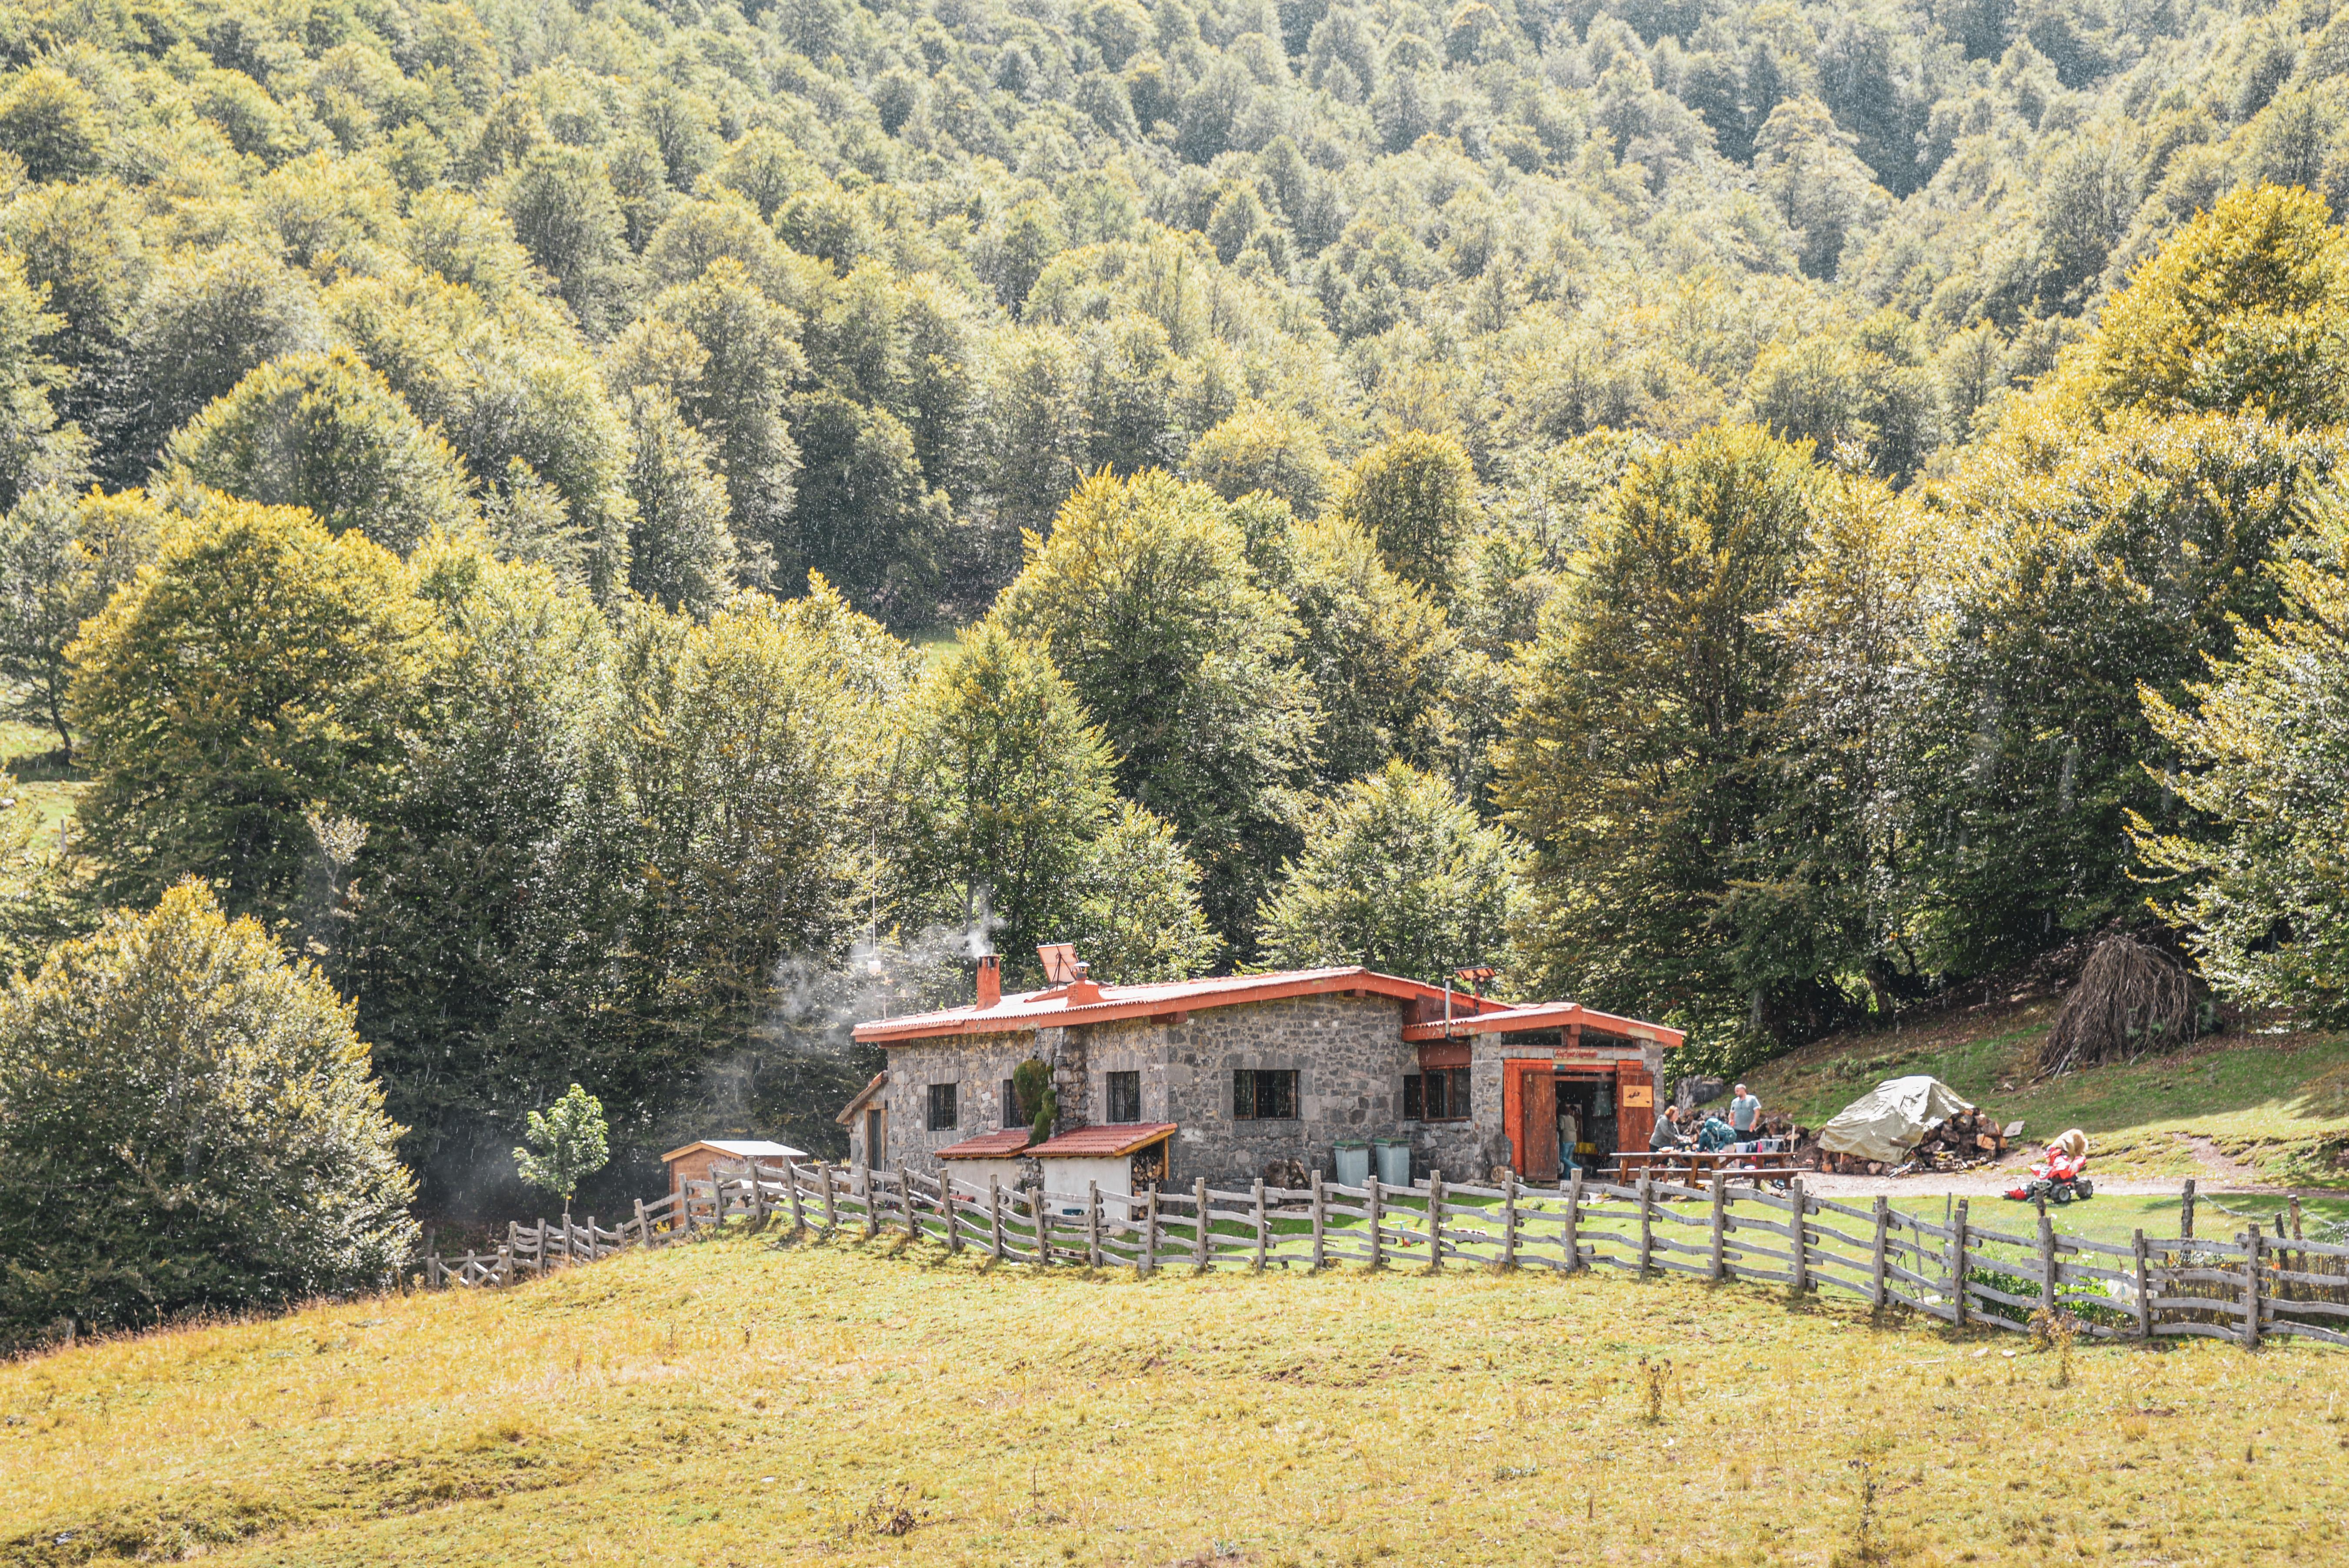 Refugio de Montaña de Vegabaño3